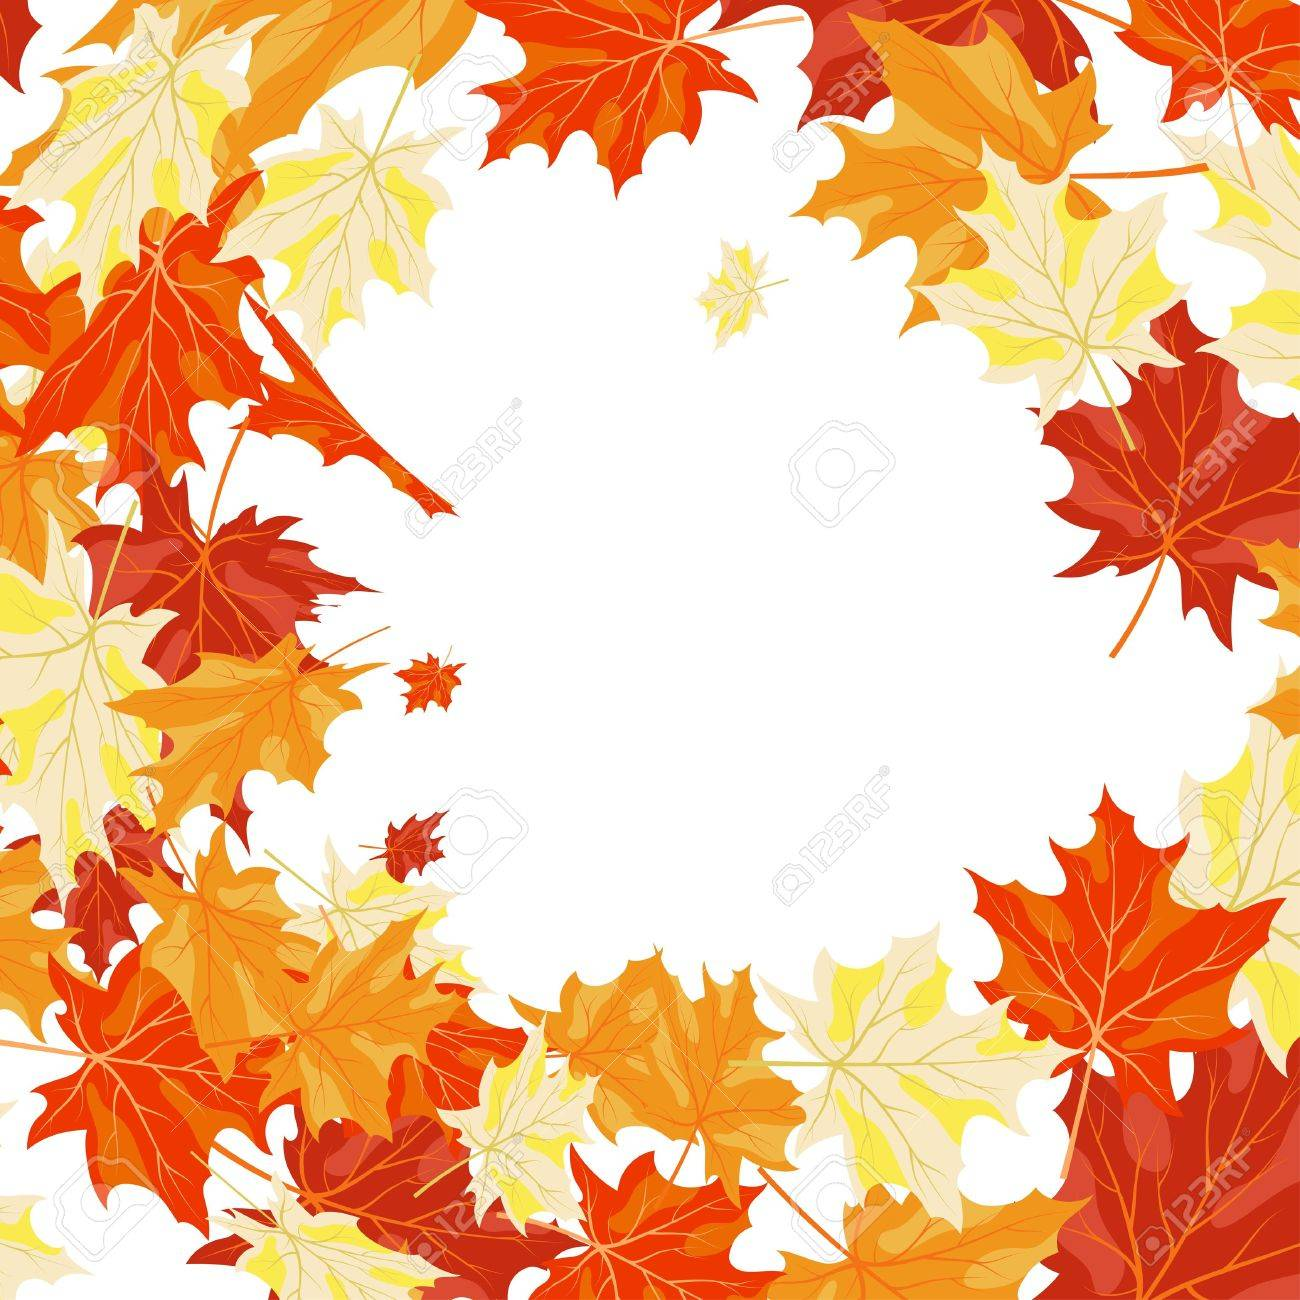 Autumn maples falling leaves background. illustration. Stock Vector - 14899197